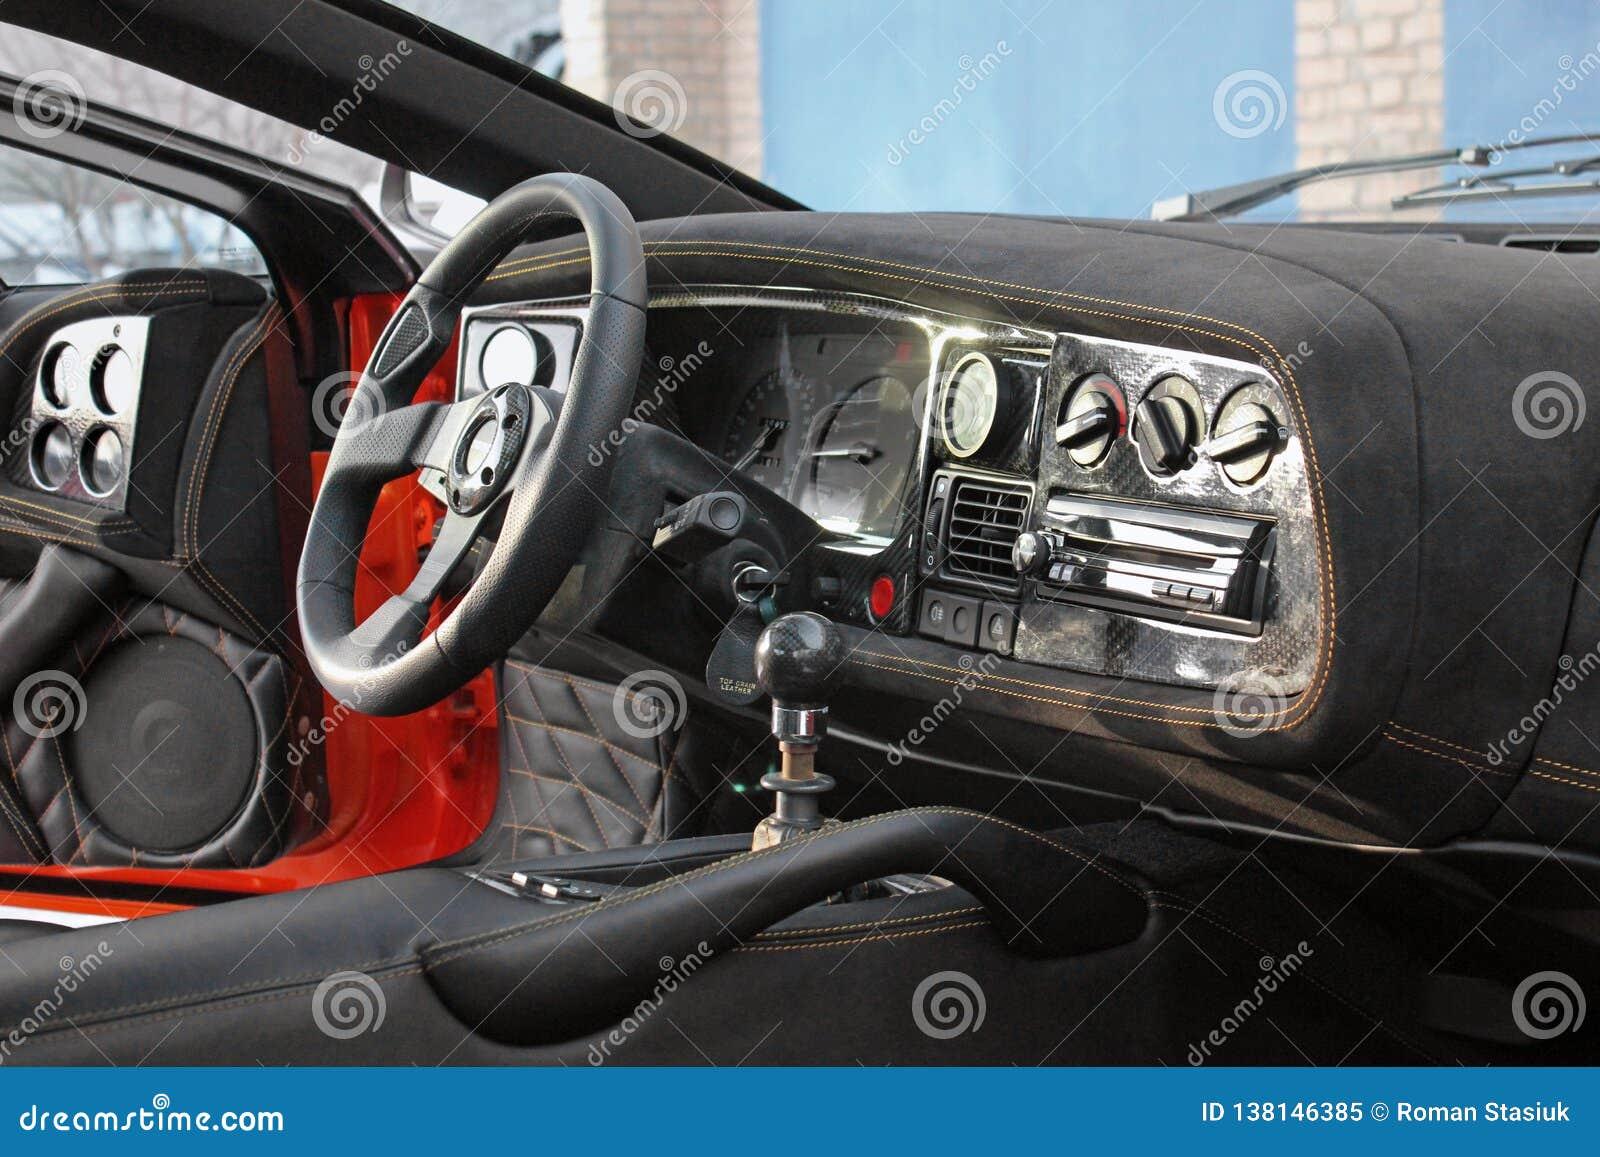 April 12 2016 Kiev Ukraine Jaguar Xj220 Car Interior Luxury Service Car Interior Details Editorial Image Image Of Detail Engine 138146385